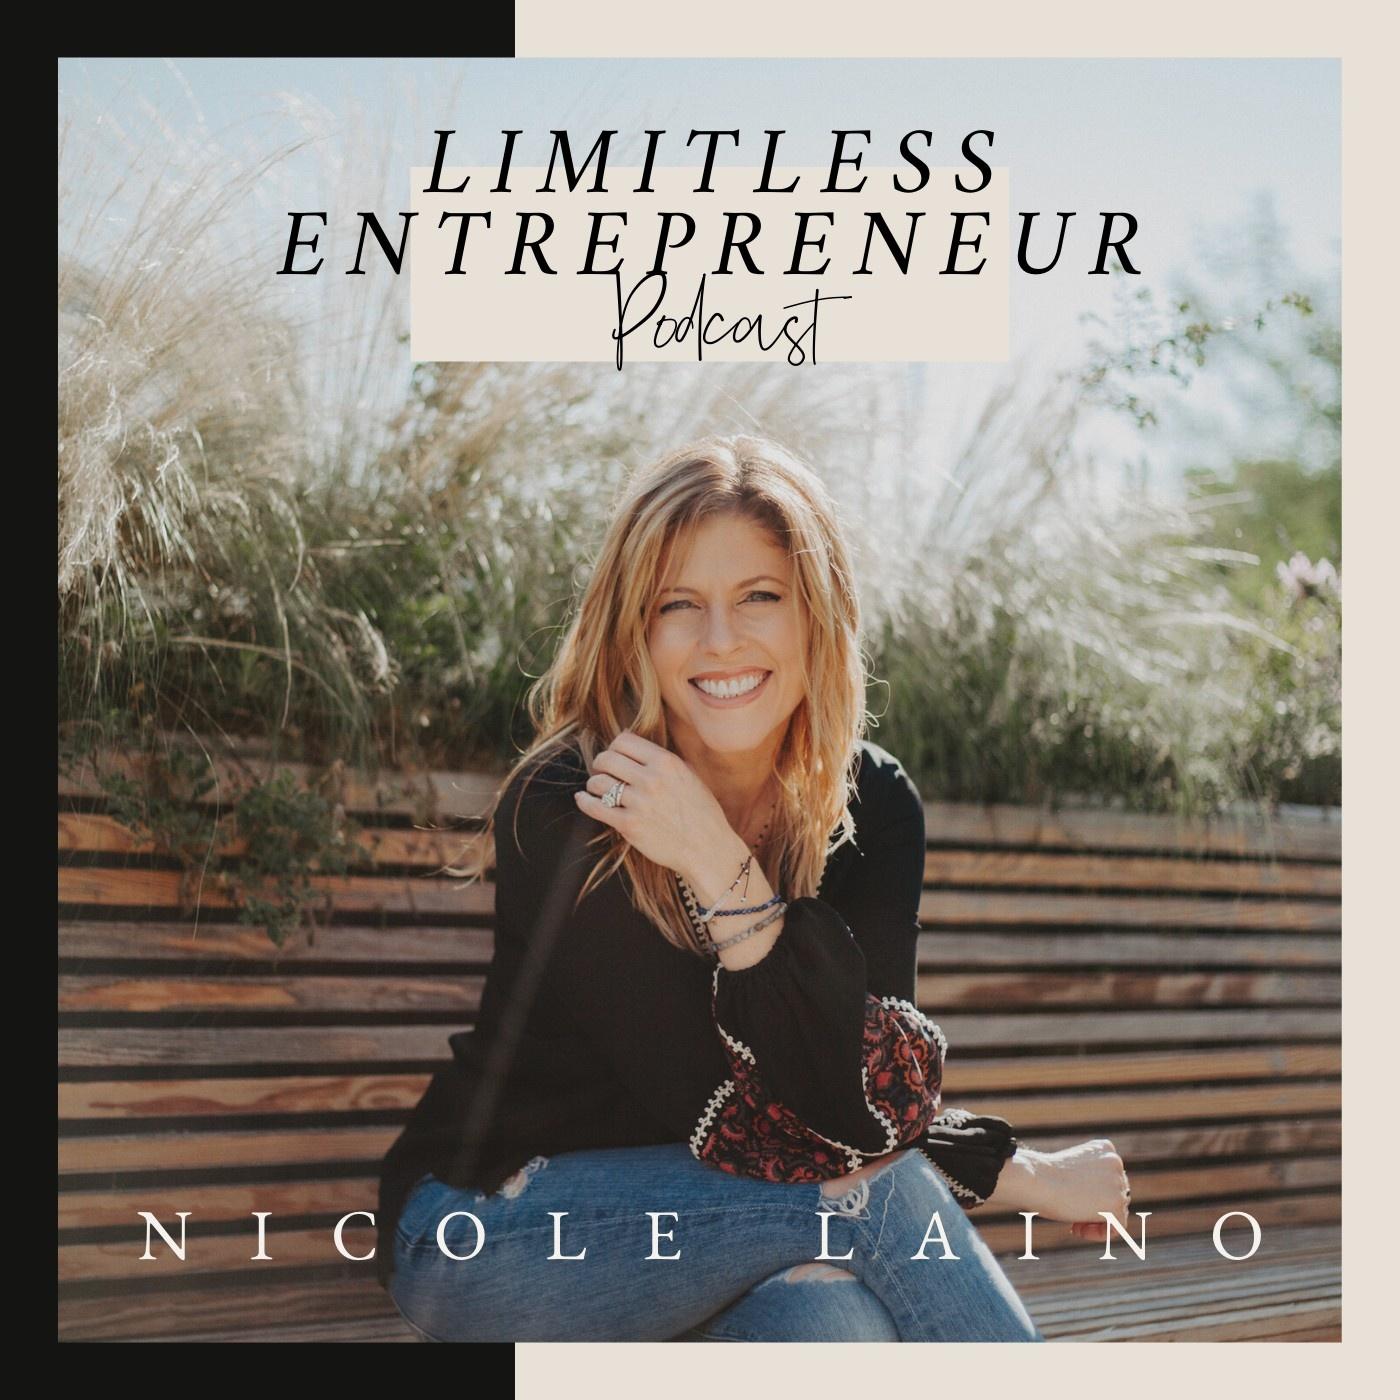 The Limitless Entrepreneur Podcast